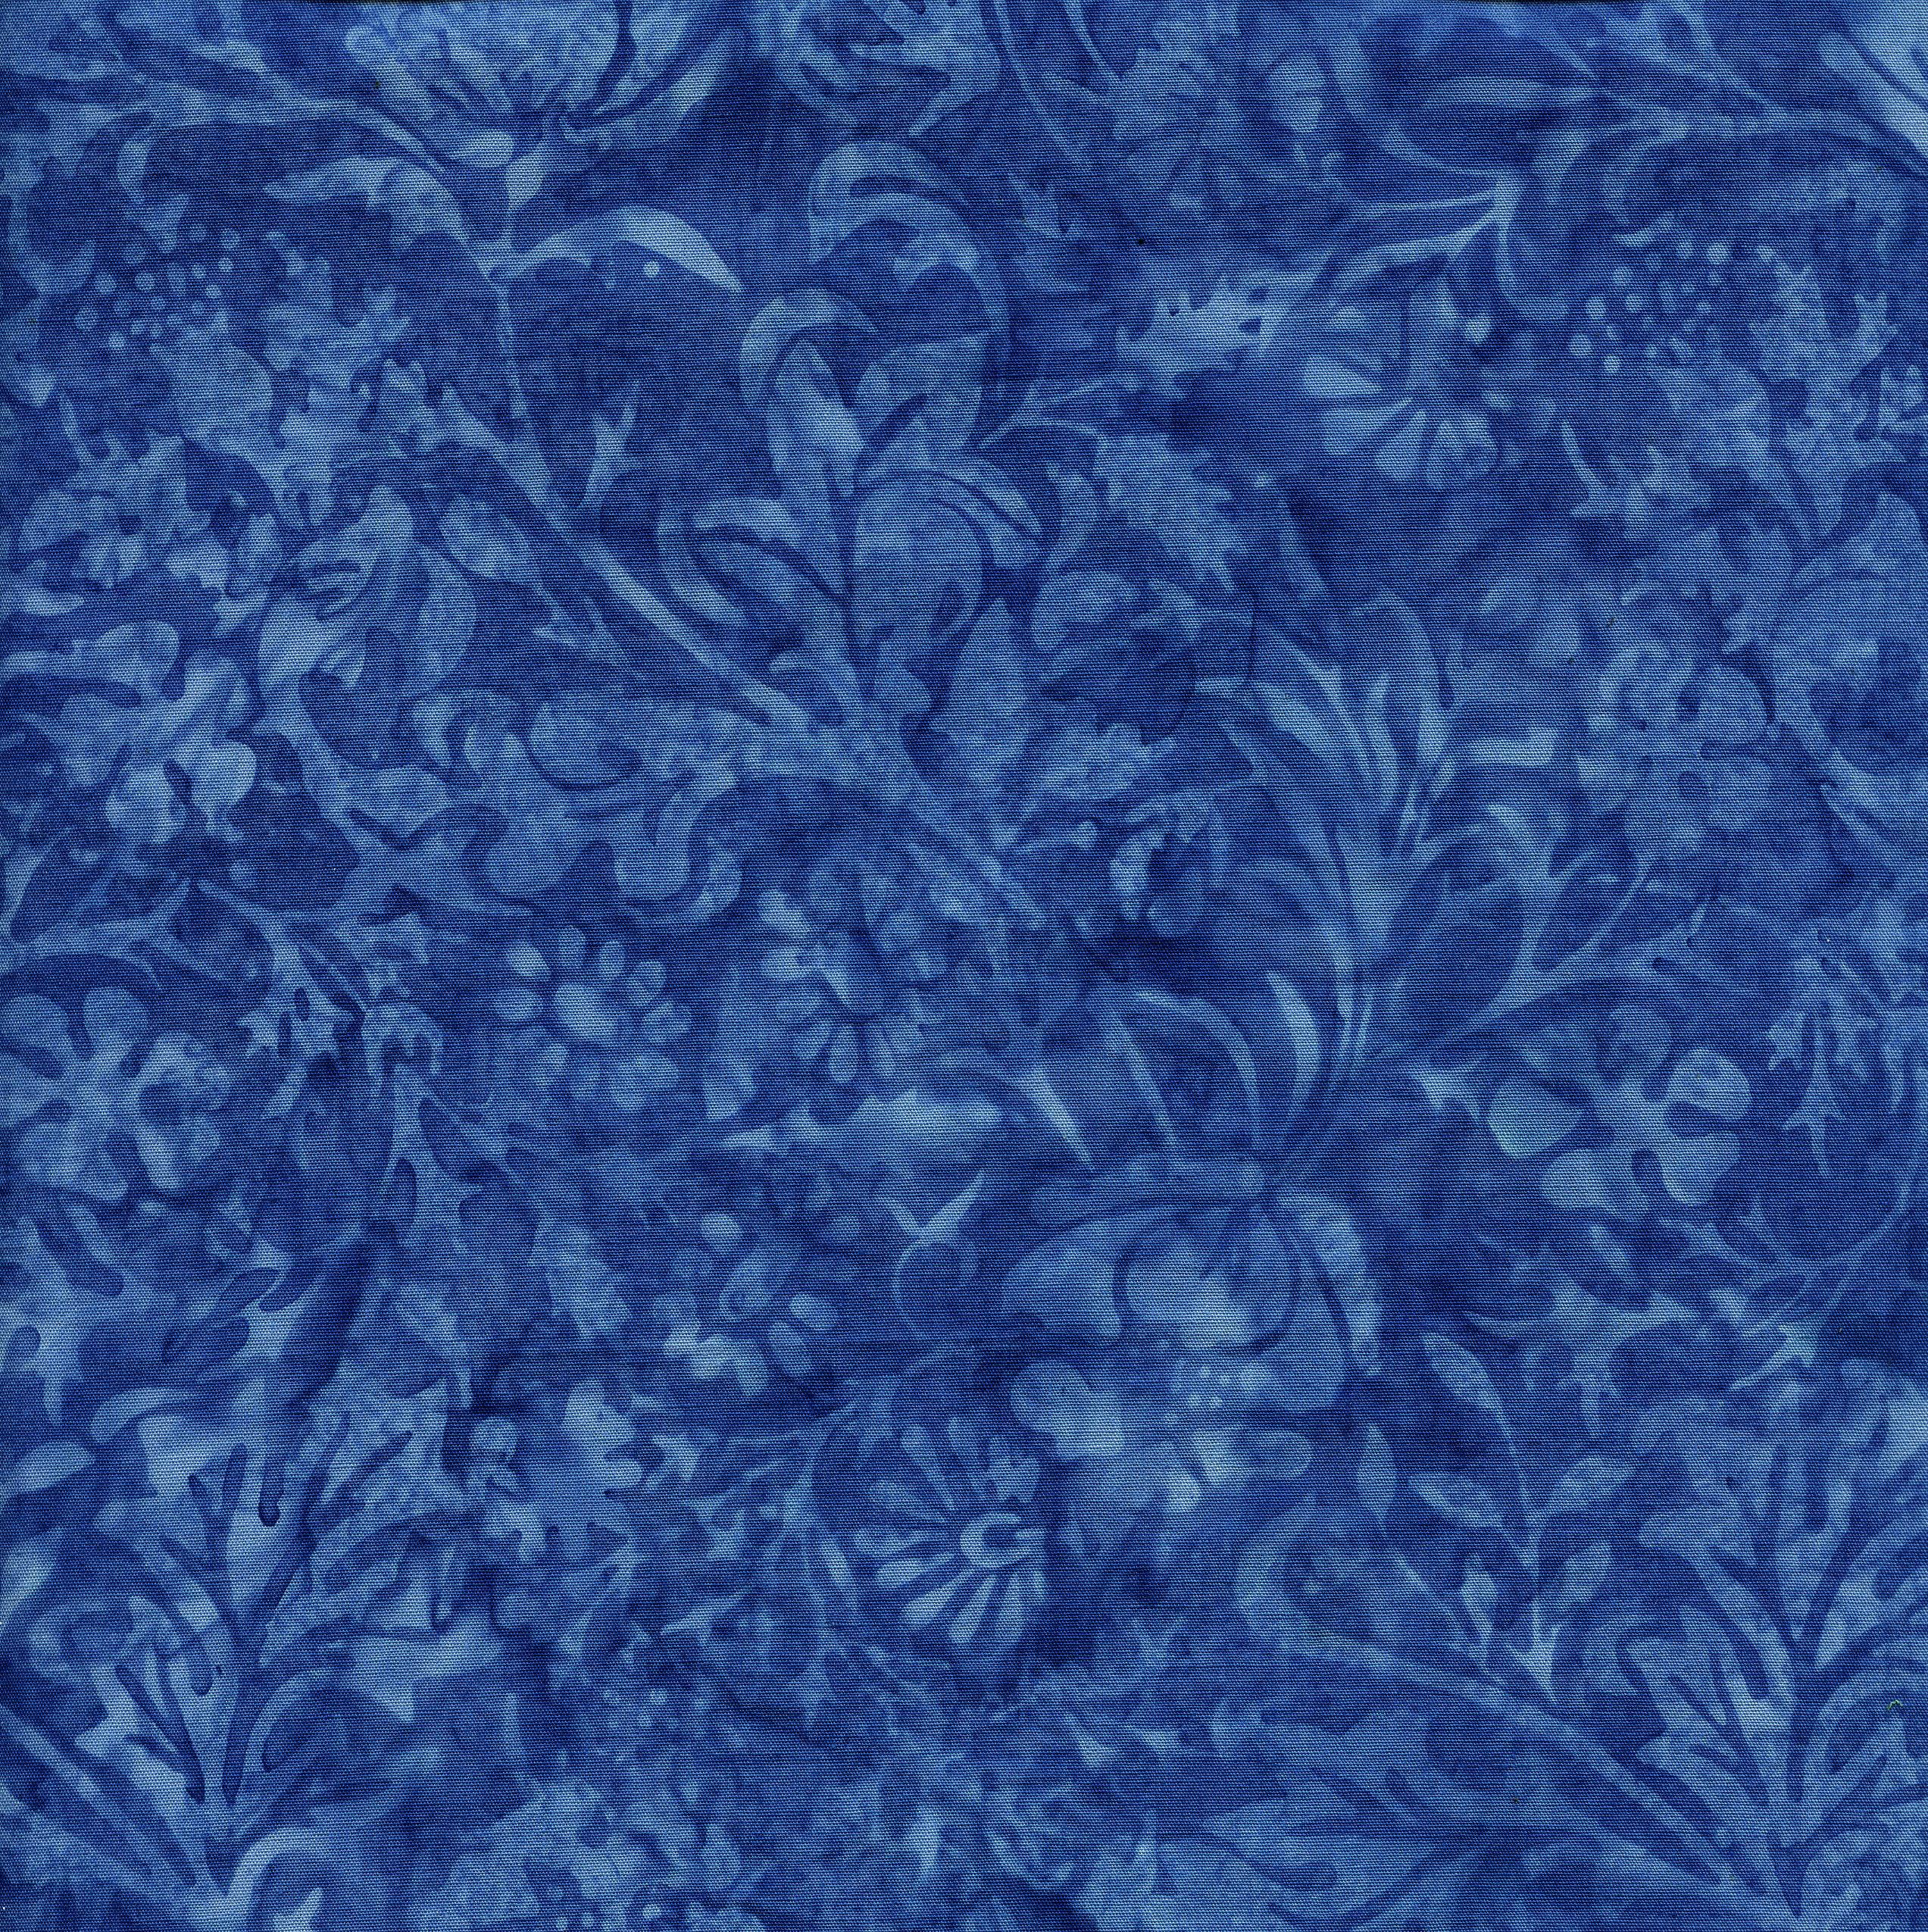 111820530 / Cherwell-Bluebird